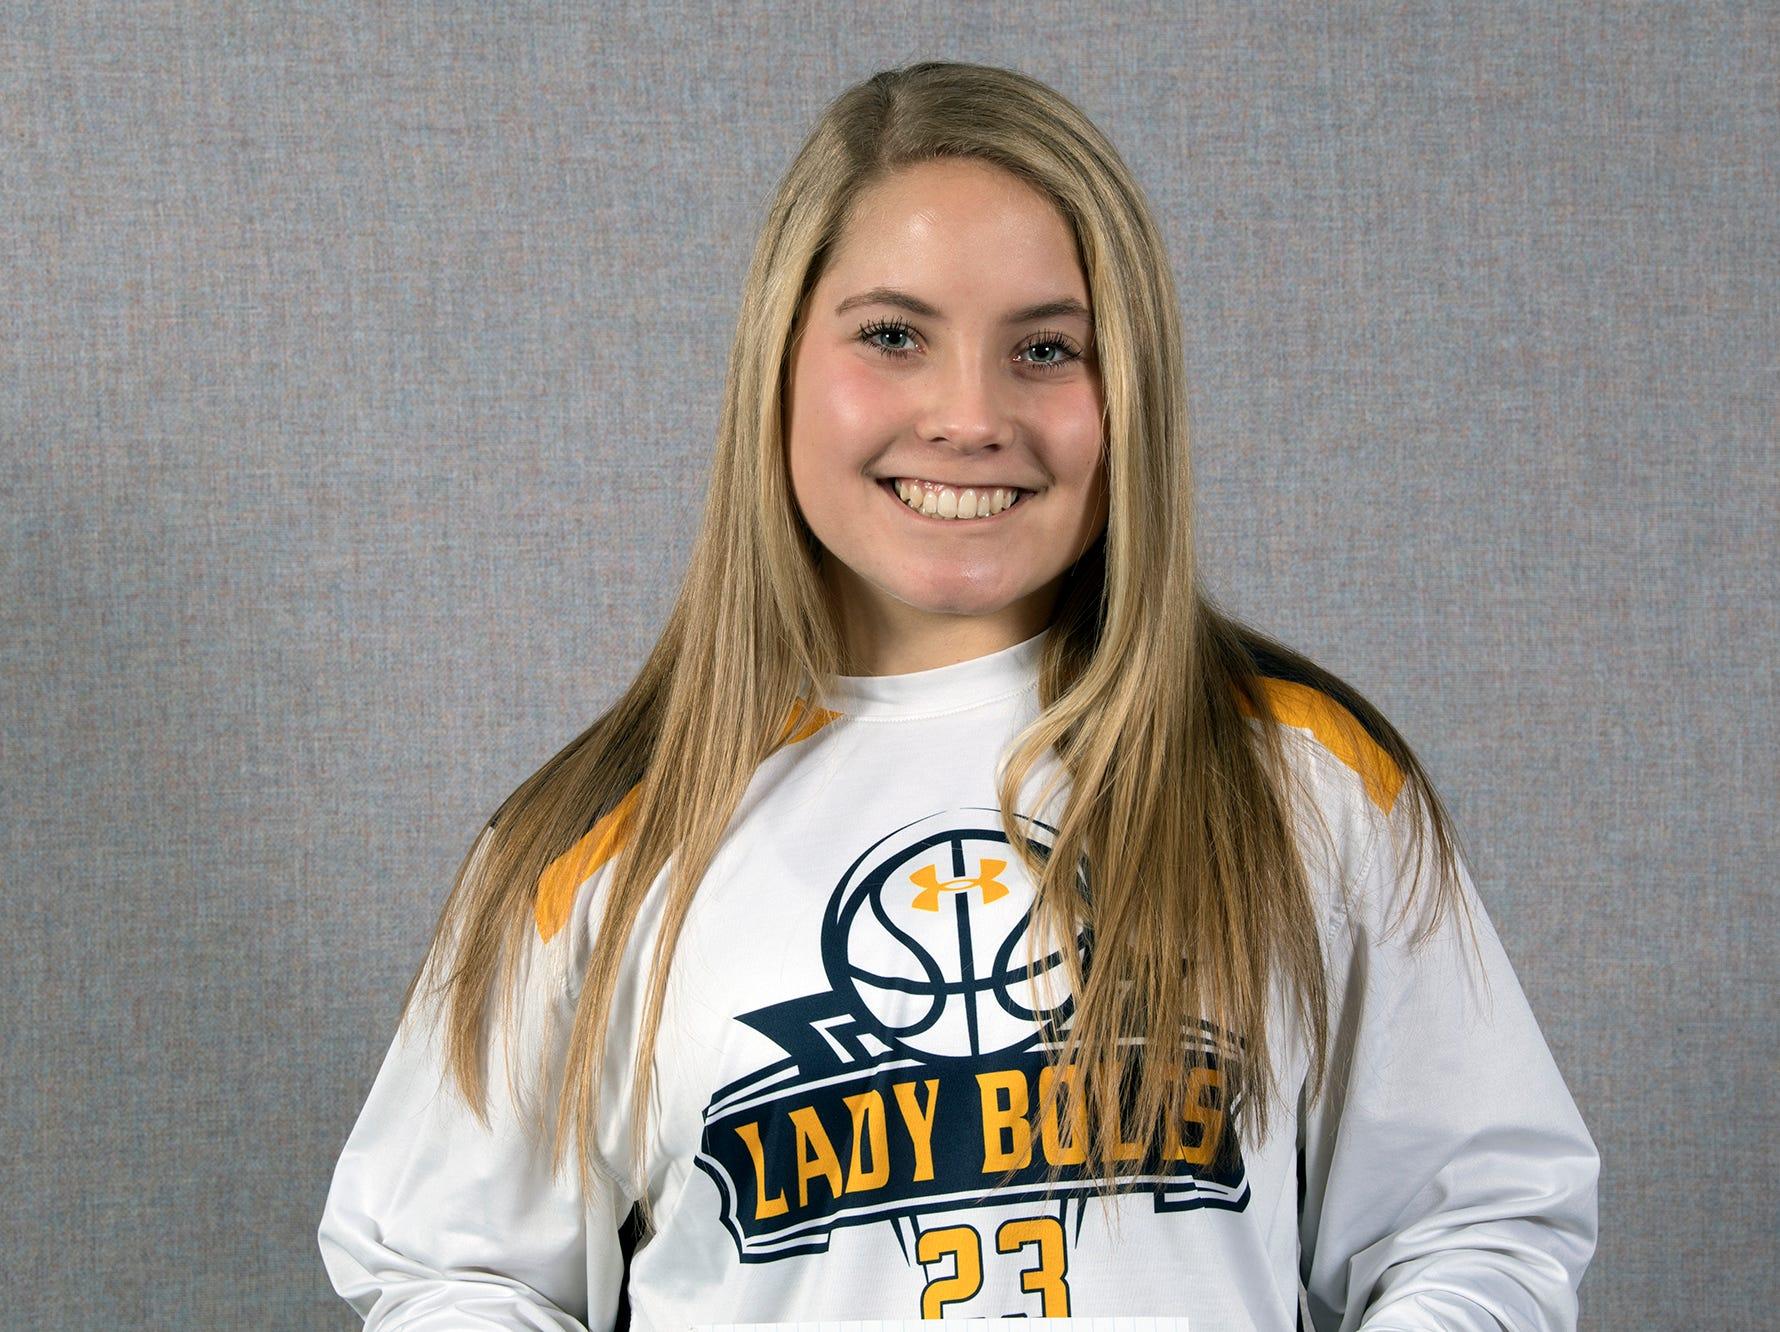 Olivia Study, of the Littlestown girls basketball team, during the 2018-19 GameTimePa YAIAA Winter Media Day Sunday November 11, 2018.